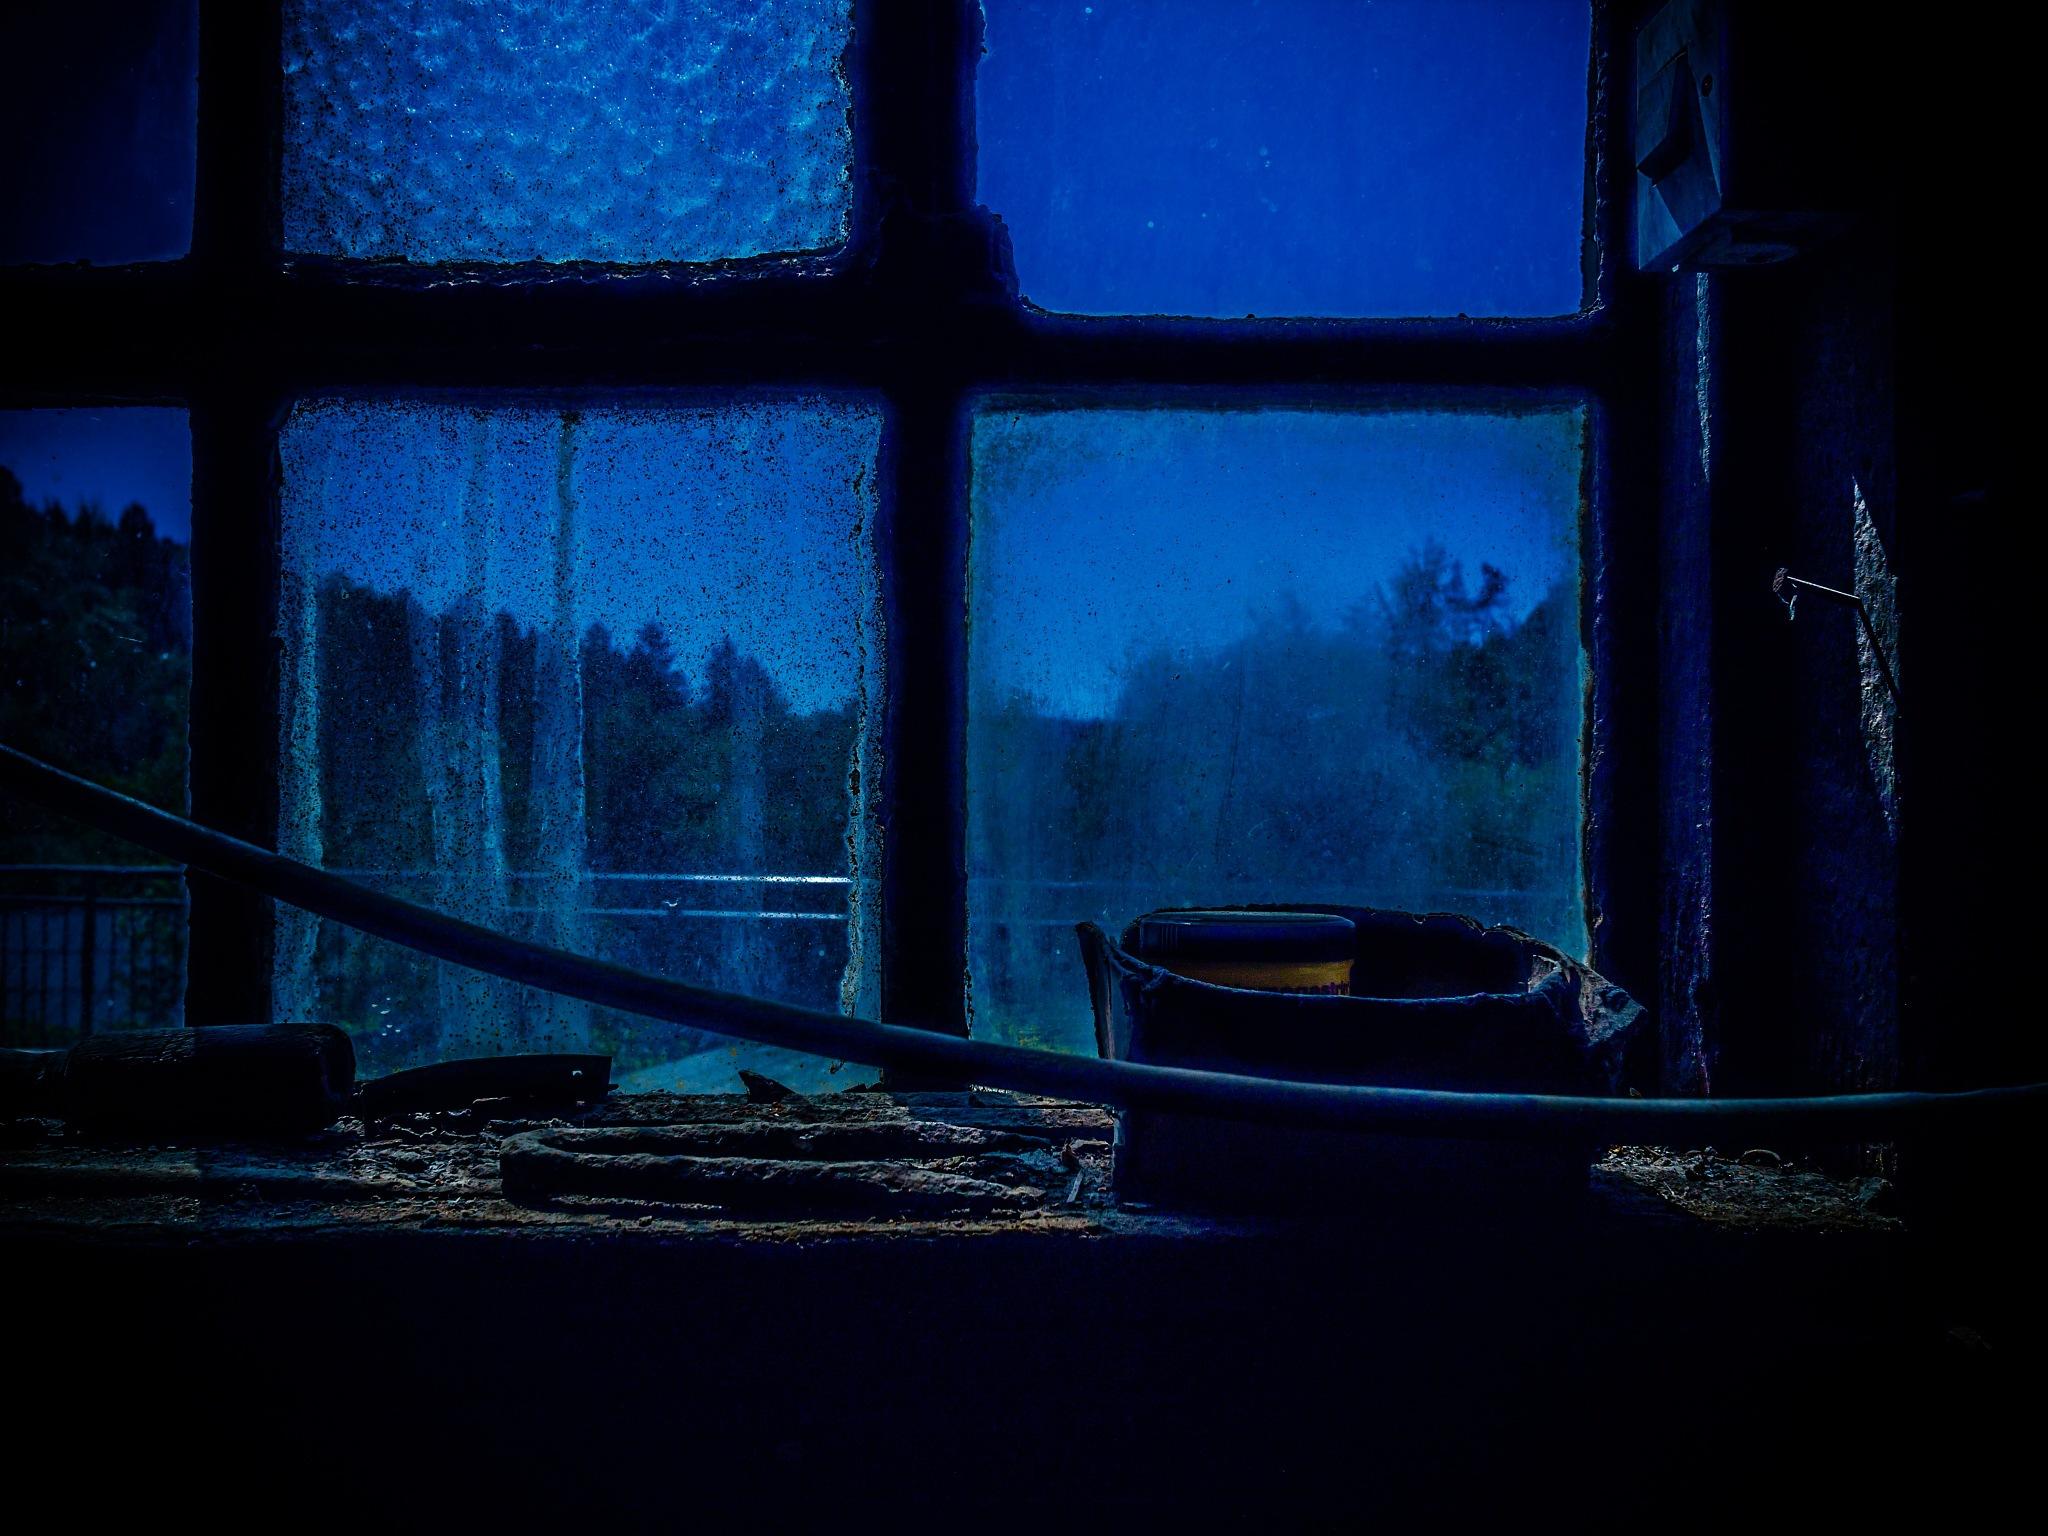 Moonlight by Brigitte Bohlscheid